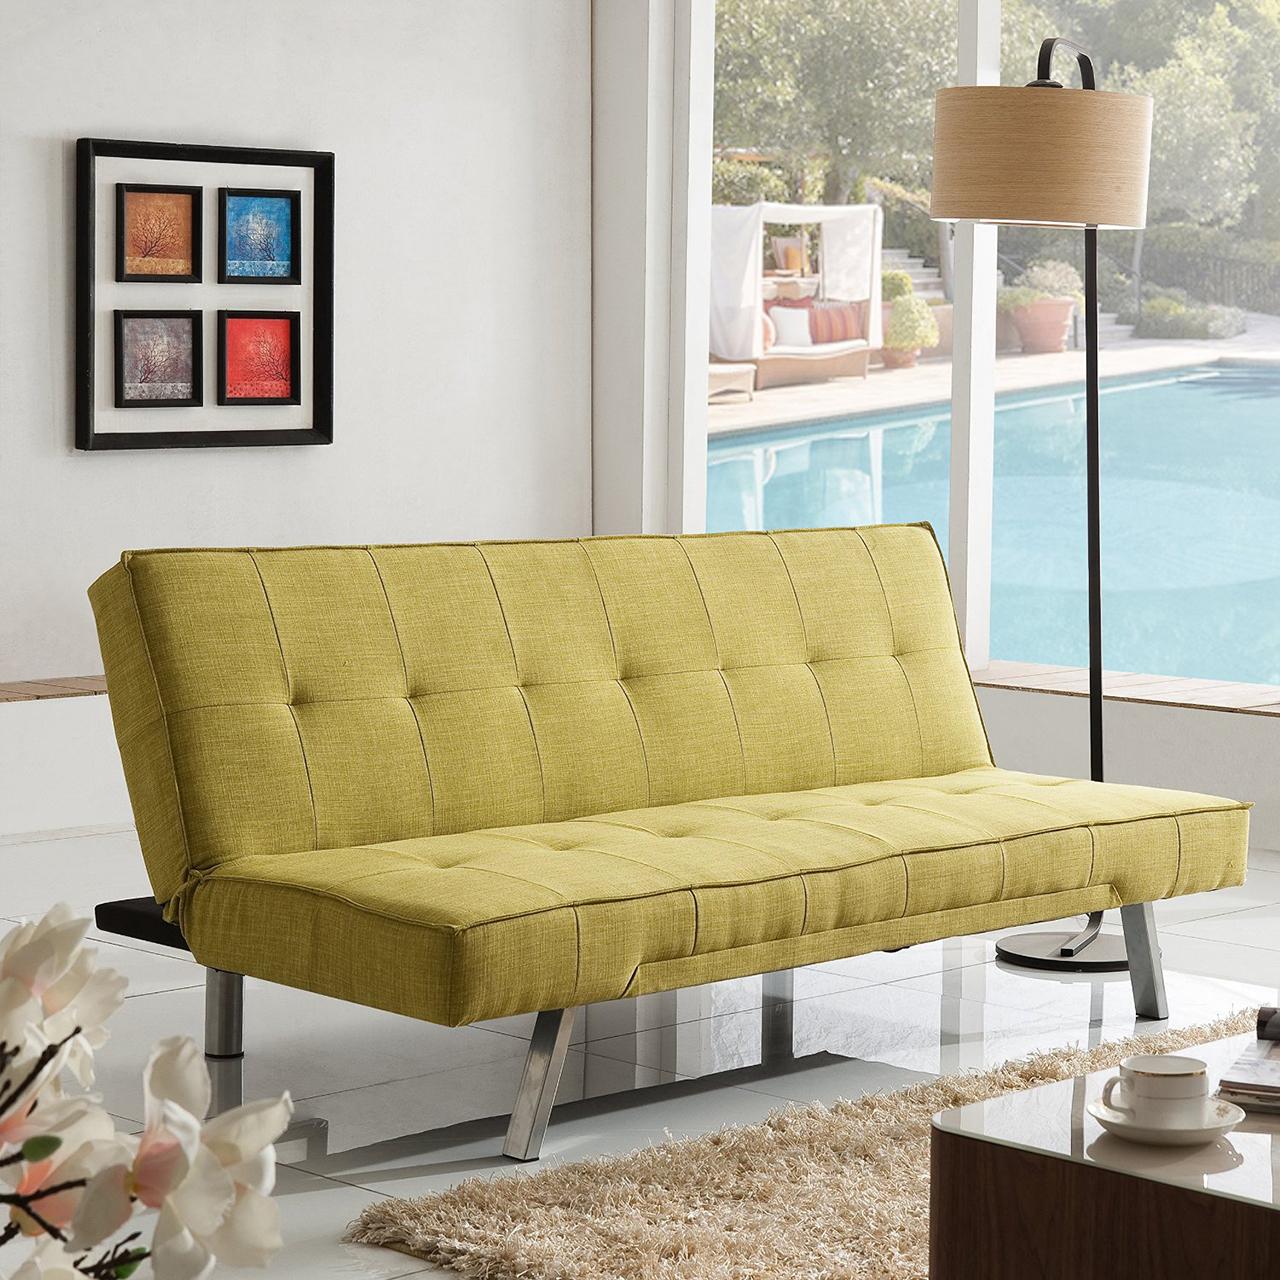 Sleeper Sofa - Sleeper Sofa Bed with Stainless Steel Legs Living Room